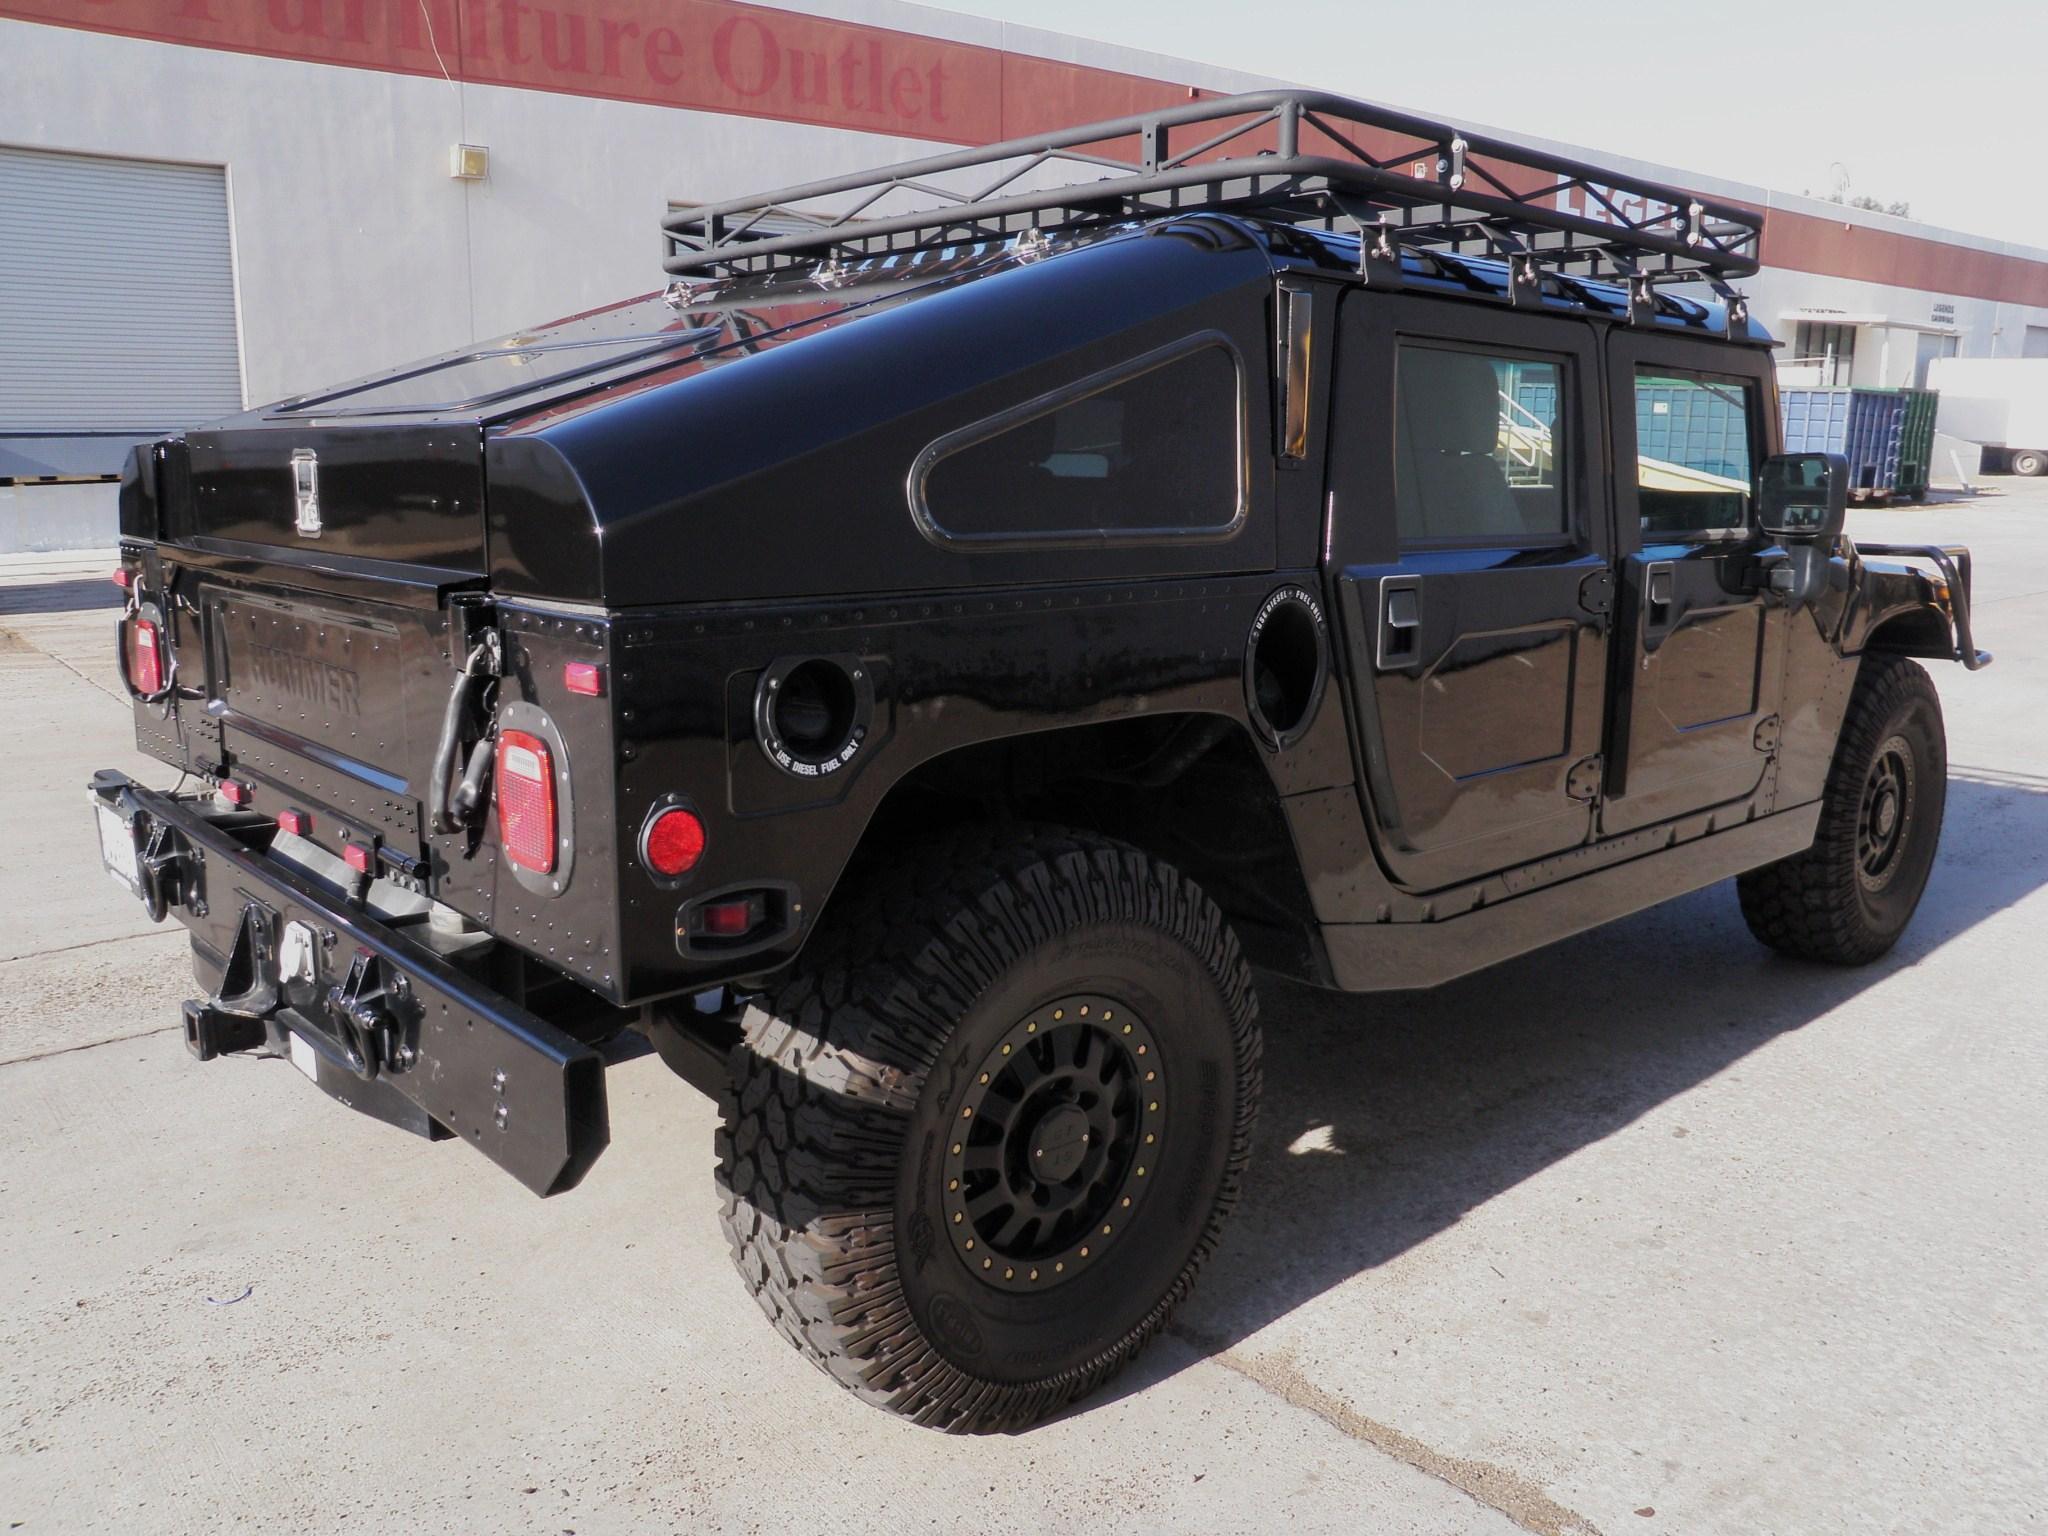 2001 Hummer H1 Hardtop W Slantback Shell Rare 1 71 Sold